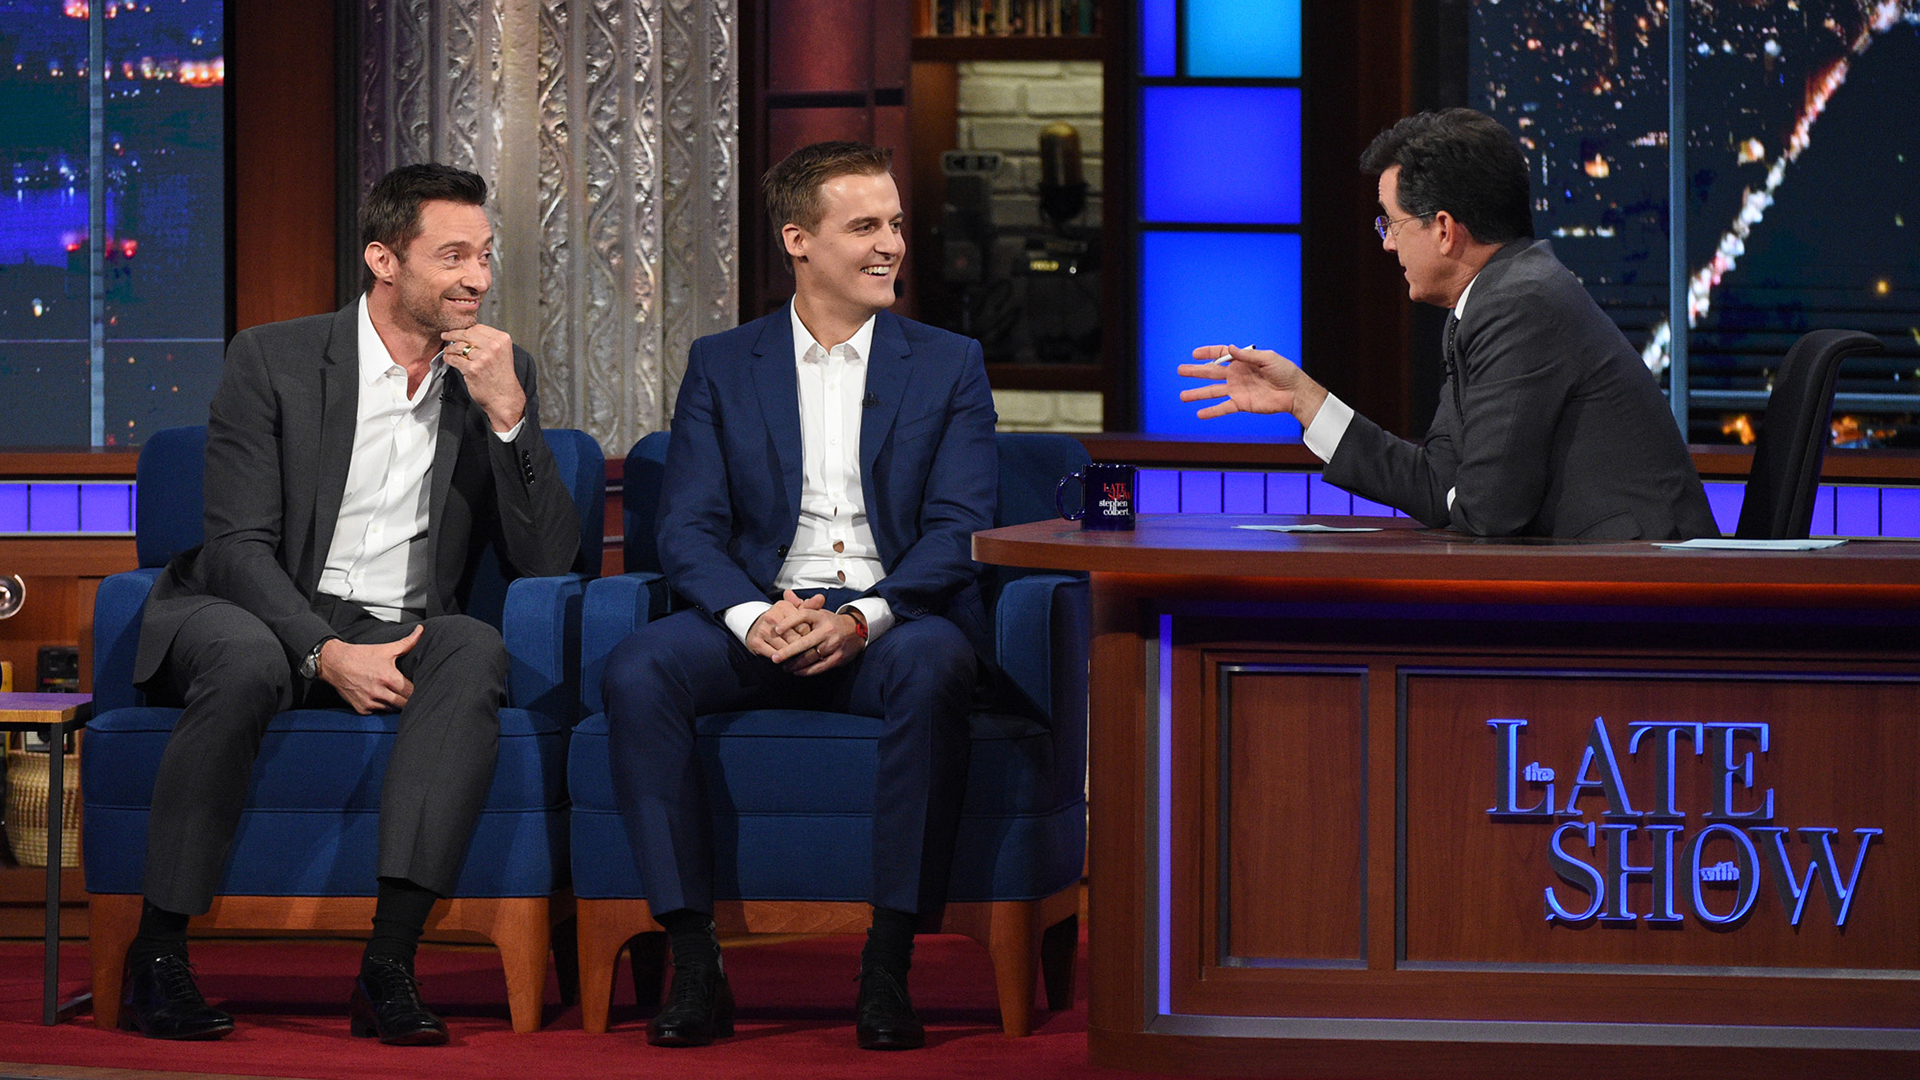 Hugh Jackman, Hugh Evans, and Stephen Colbert